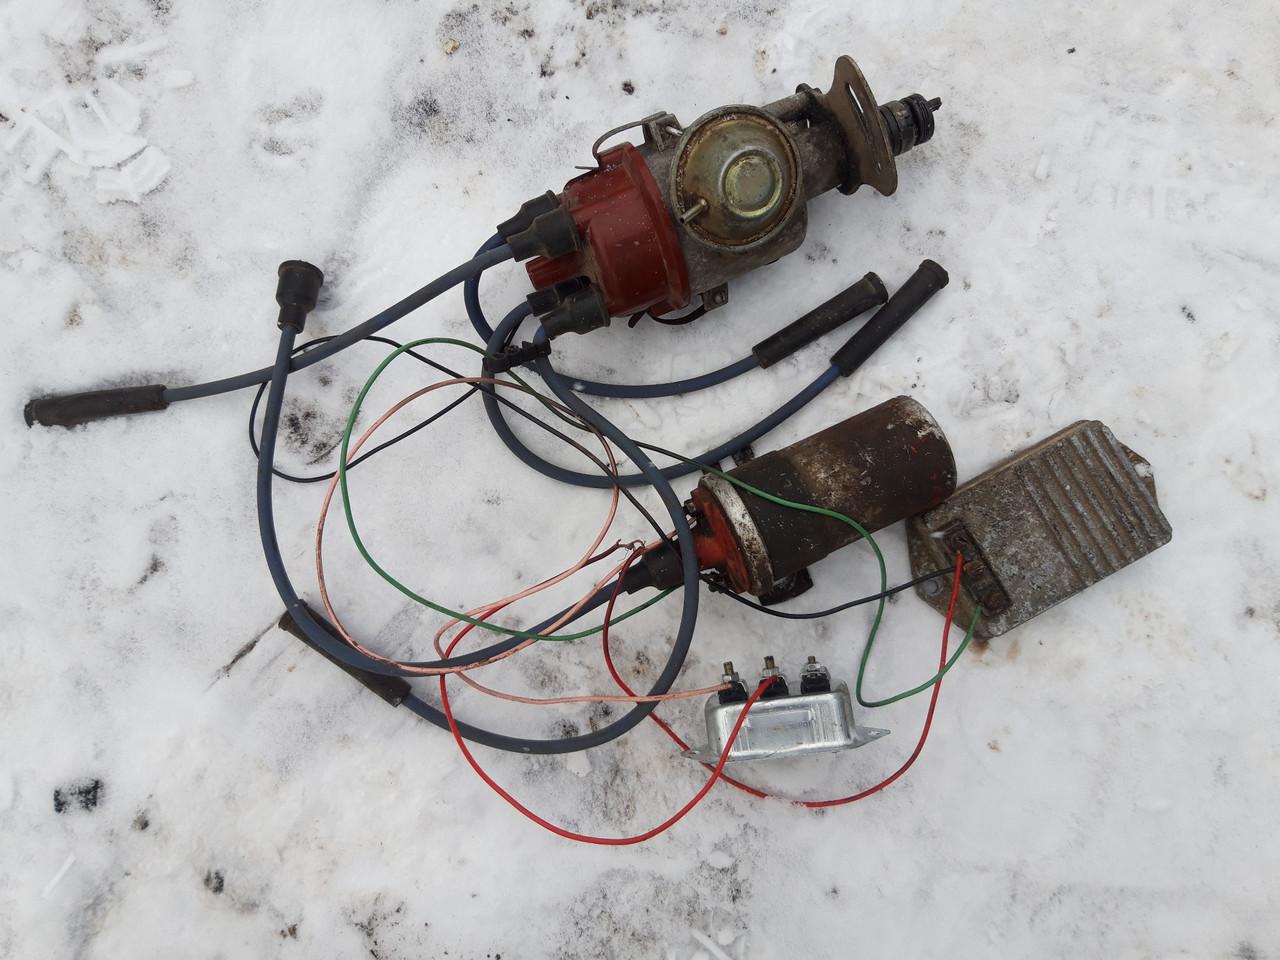 Запалювання безконтактне старого зразка Газель Соболь Волга ГАЗ ЗМЗ 402 дв